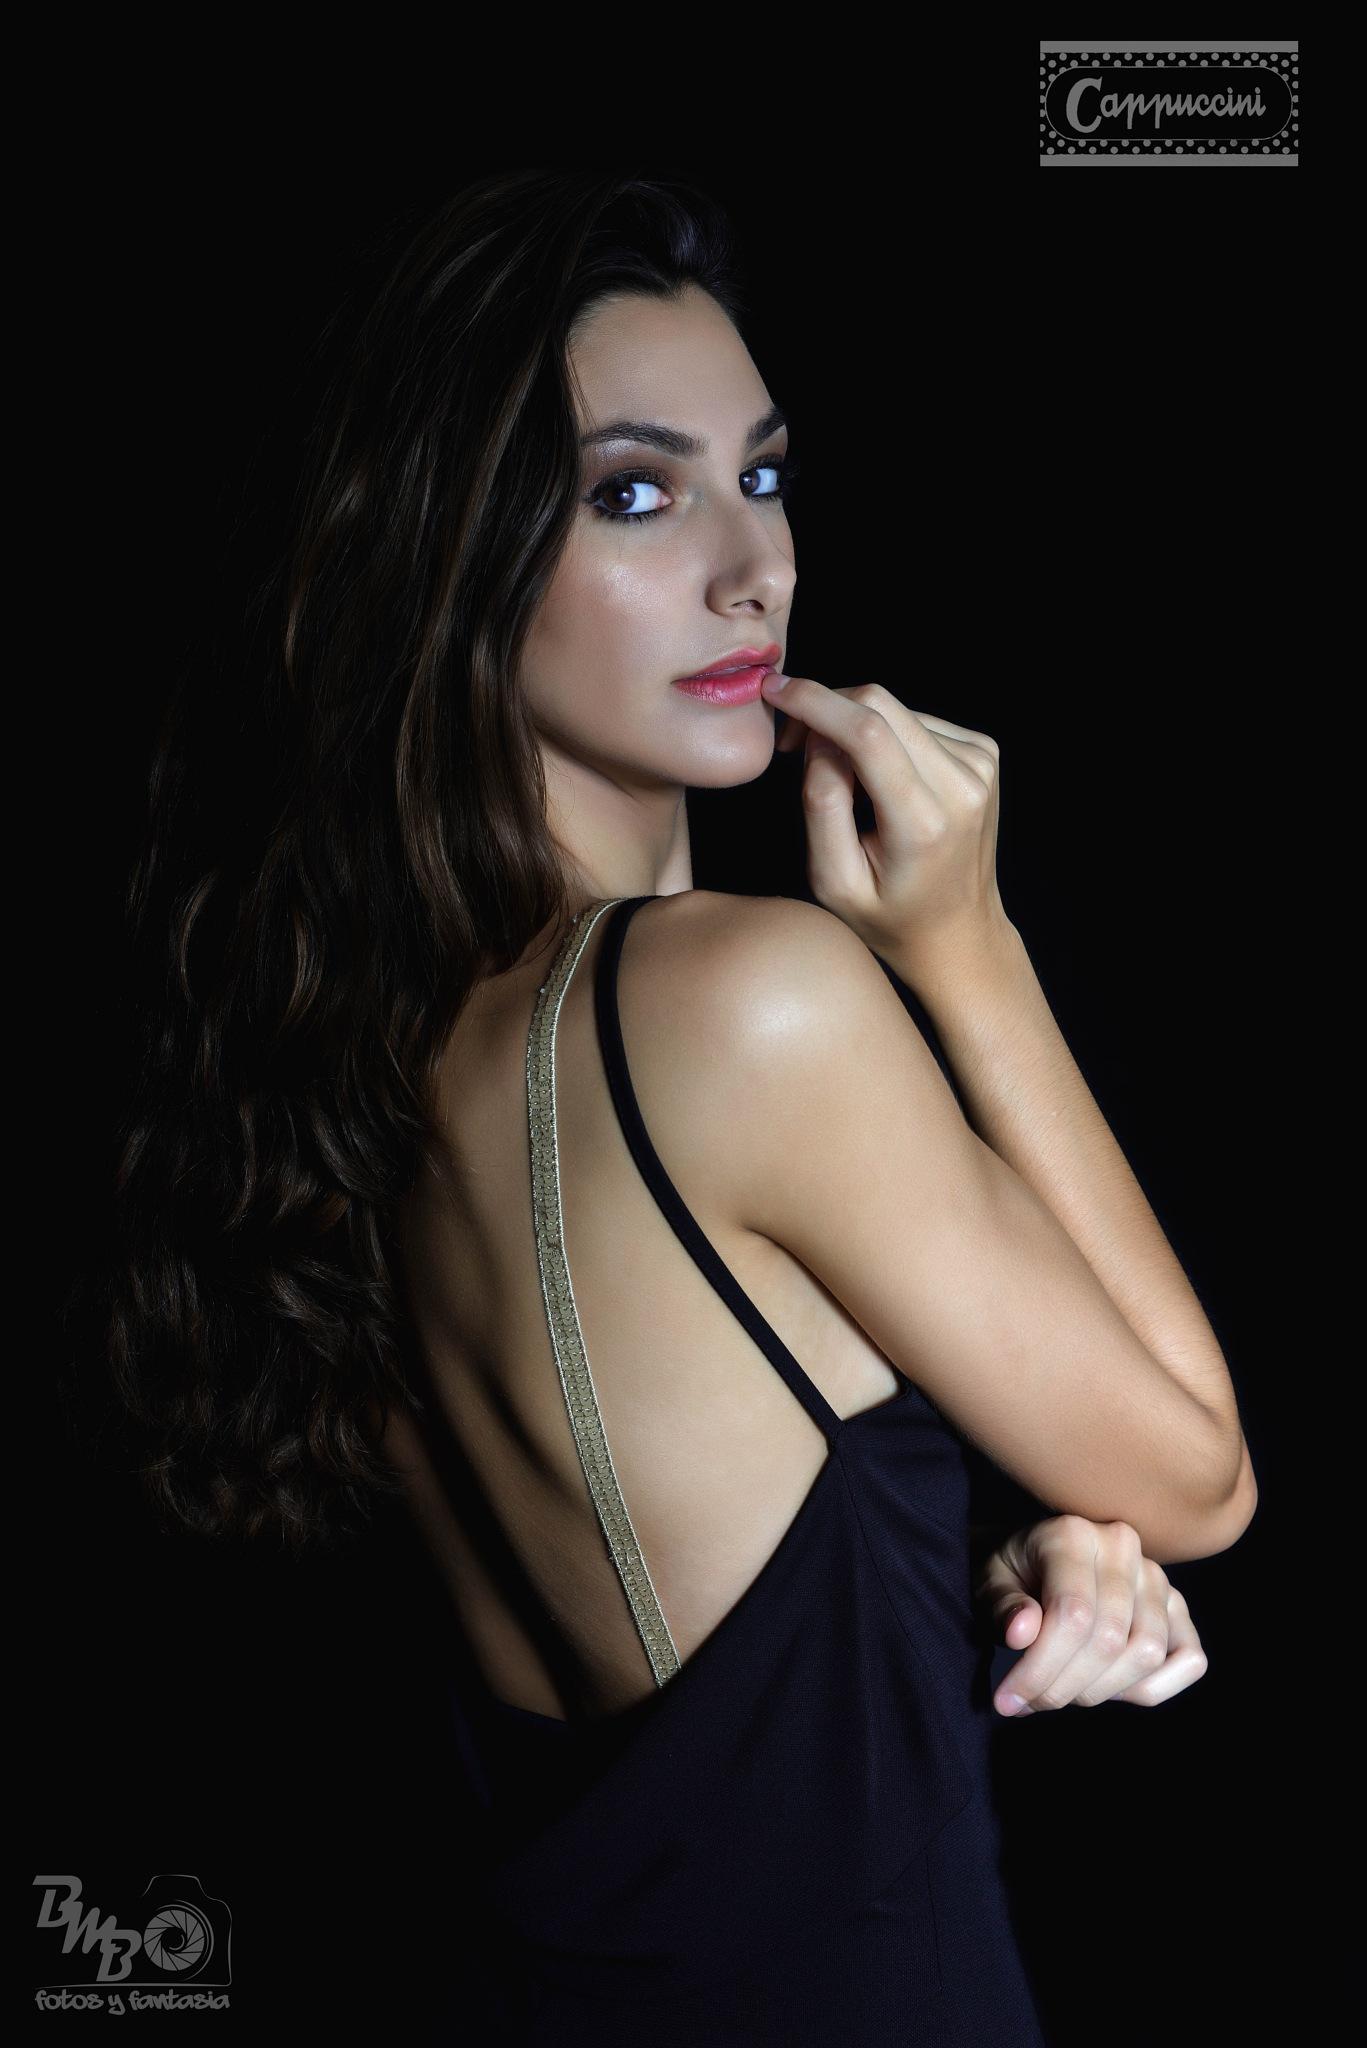 Beauty dark portrait by Biel_Moragues